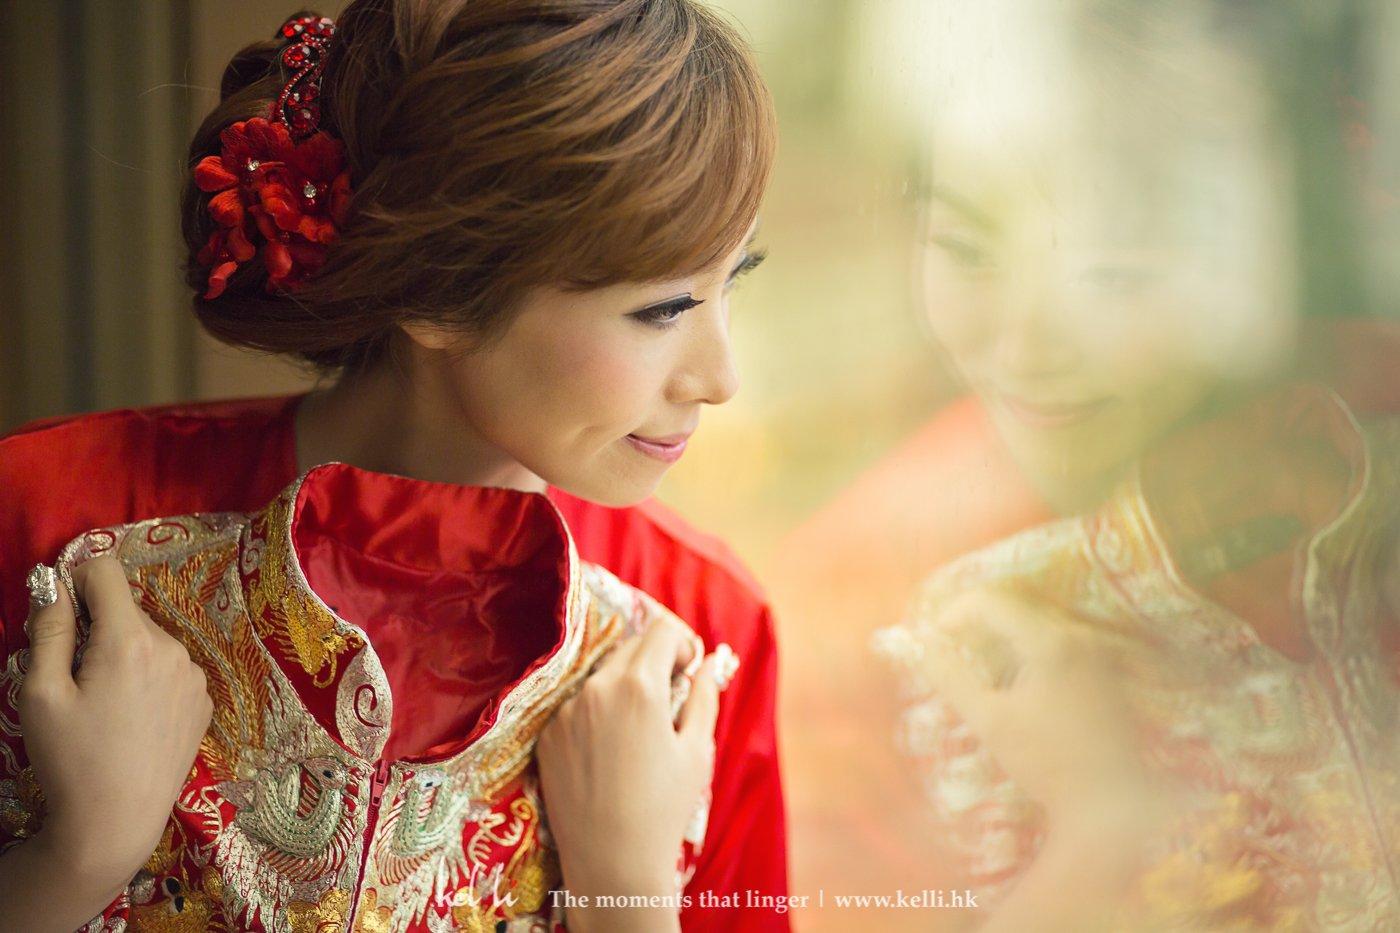 Kel Li Art Gallery - 新娘在婚禮當天,期待著上褂的心情